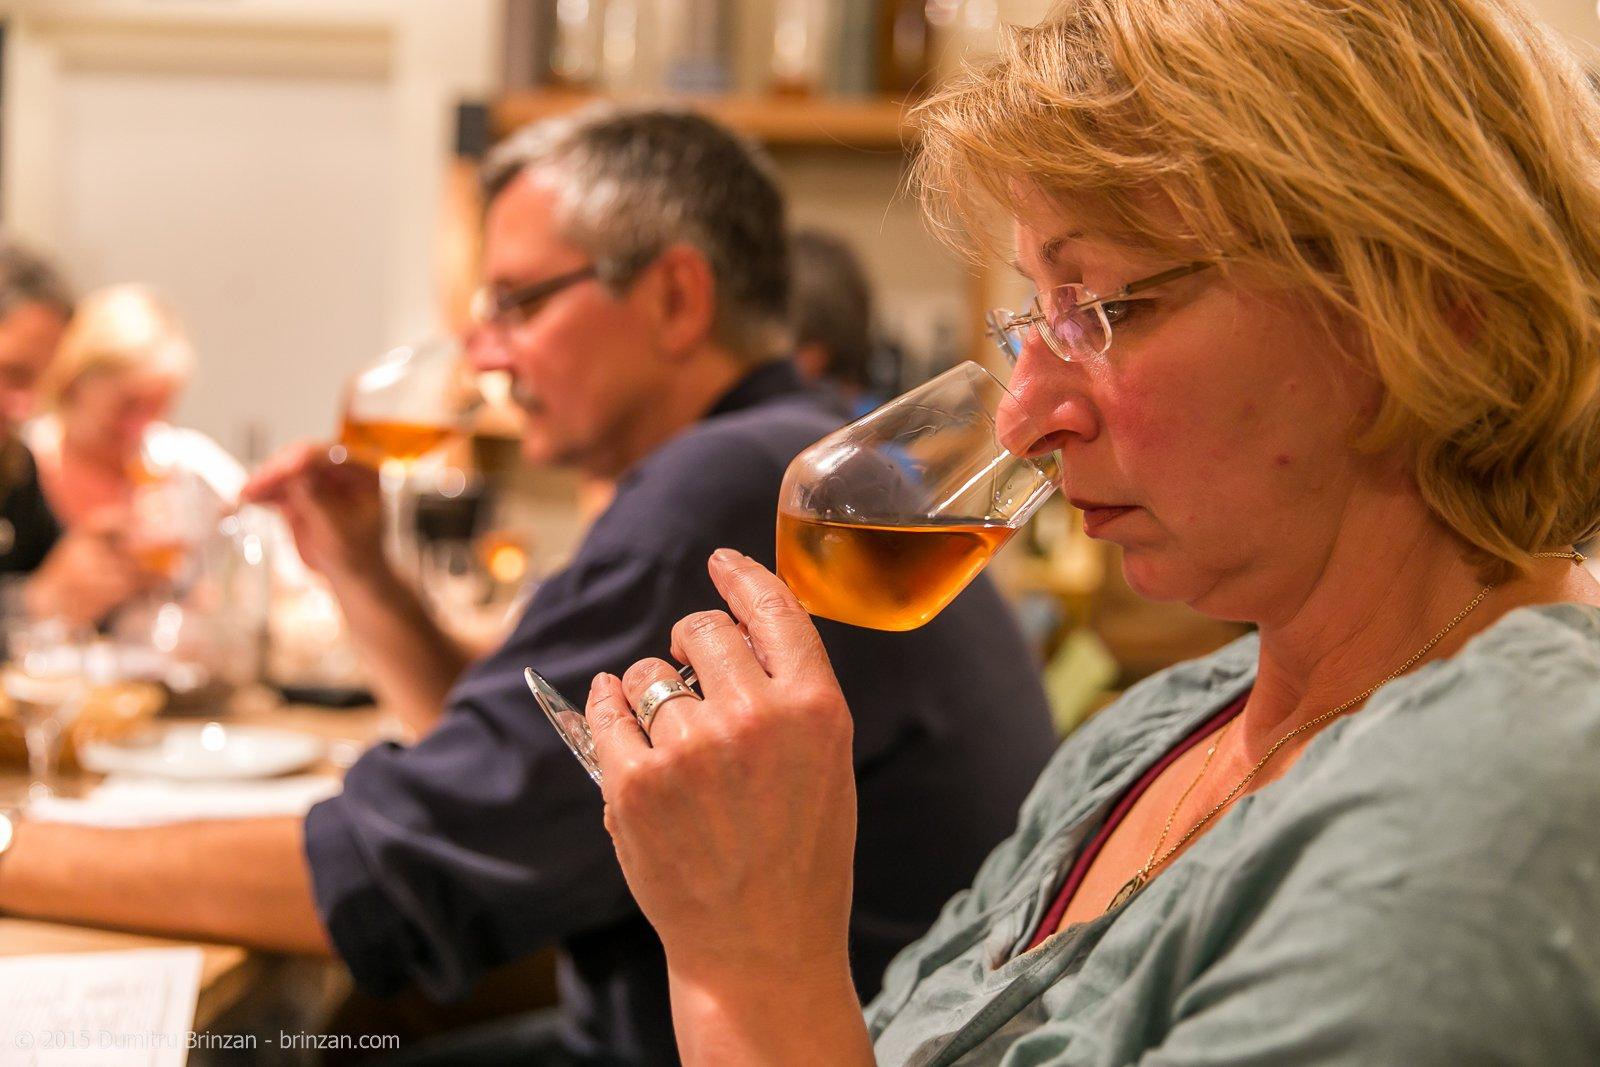 weinadvokat-dortmund-moldovan-wines-2015-18